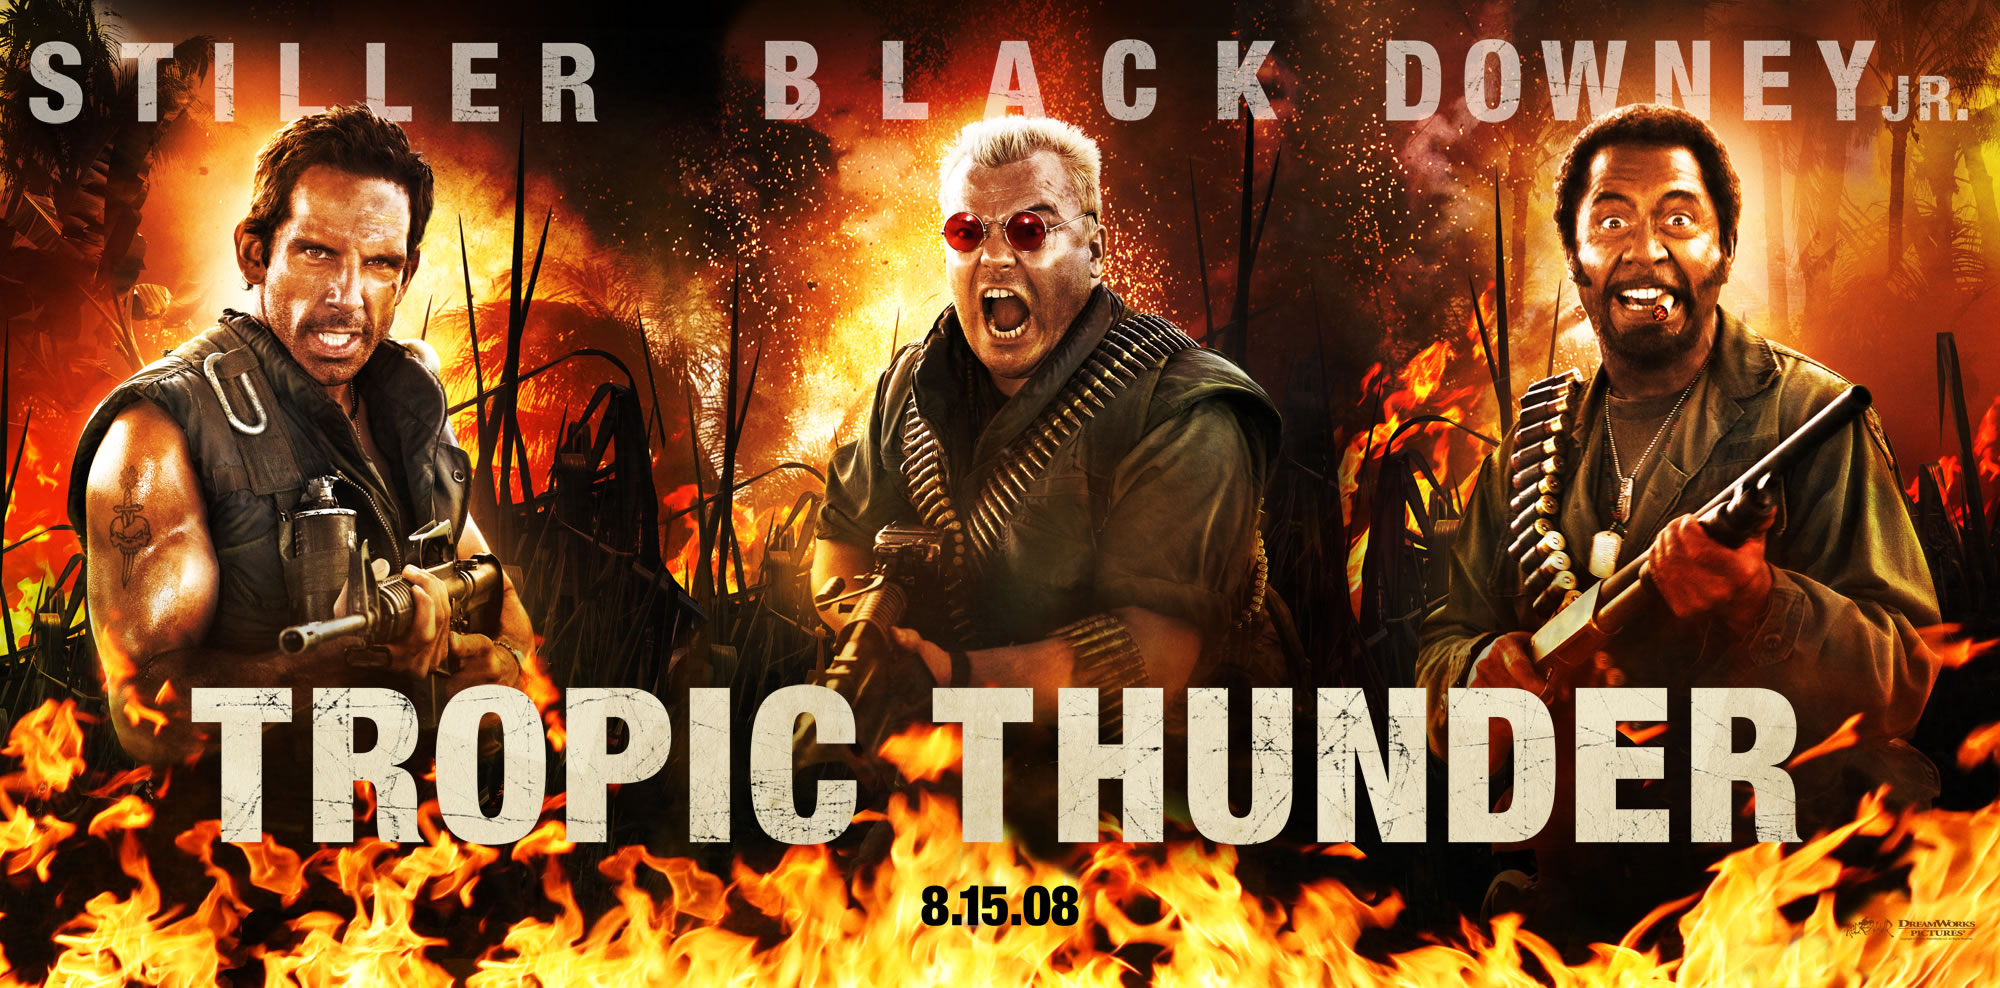 Tropic thunder movie music